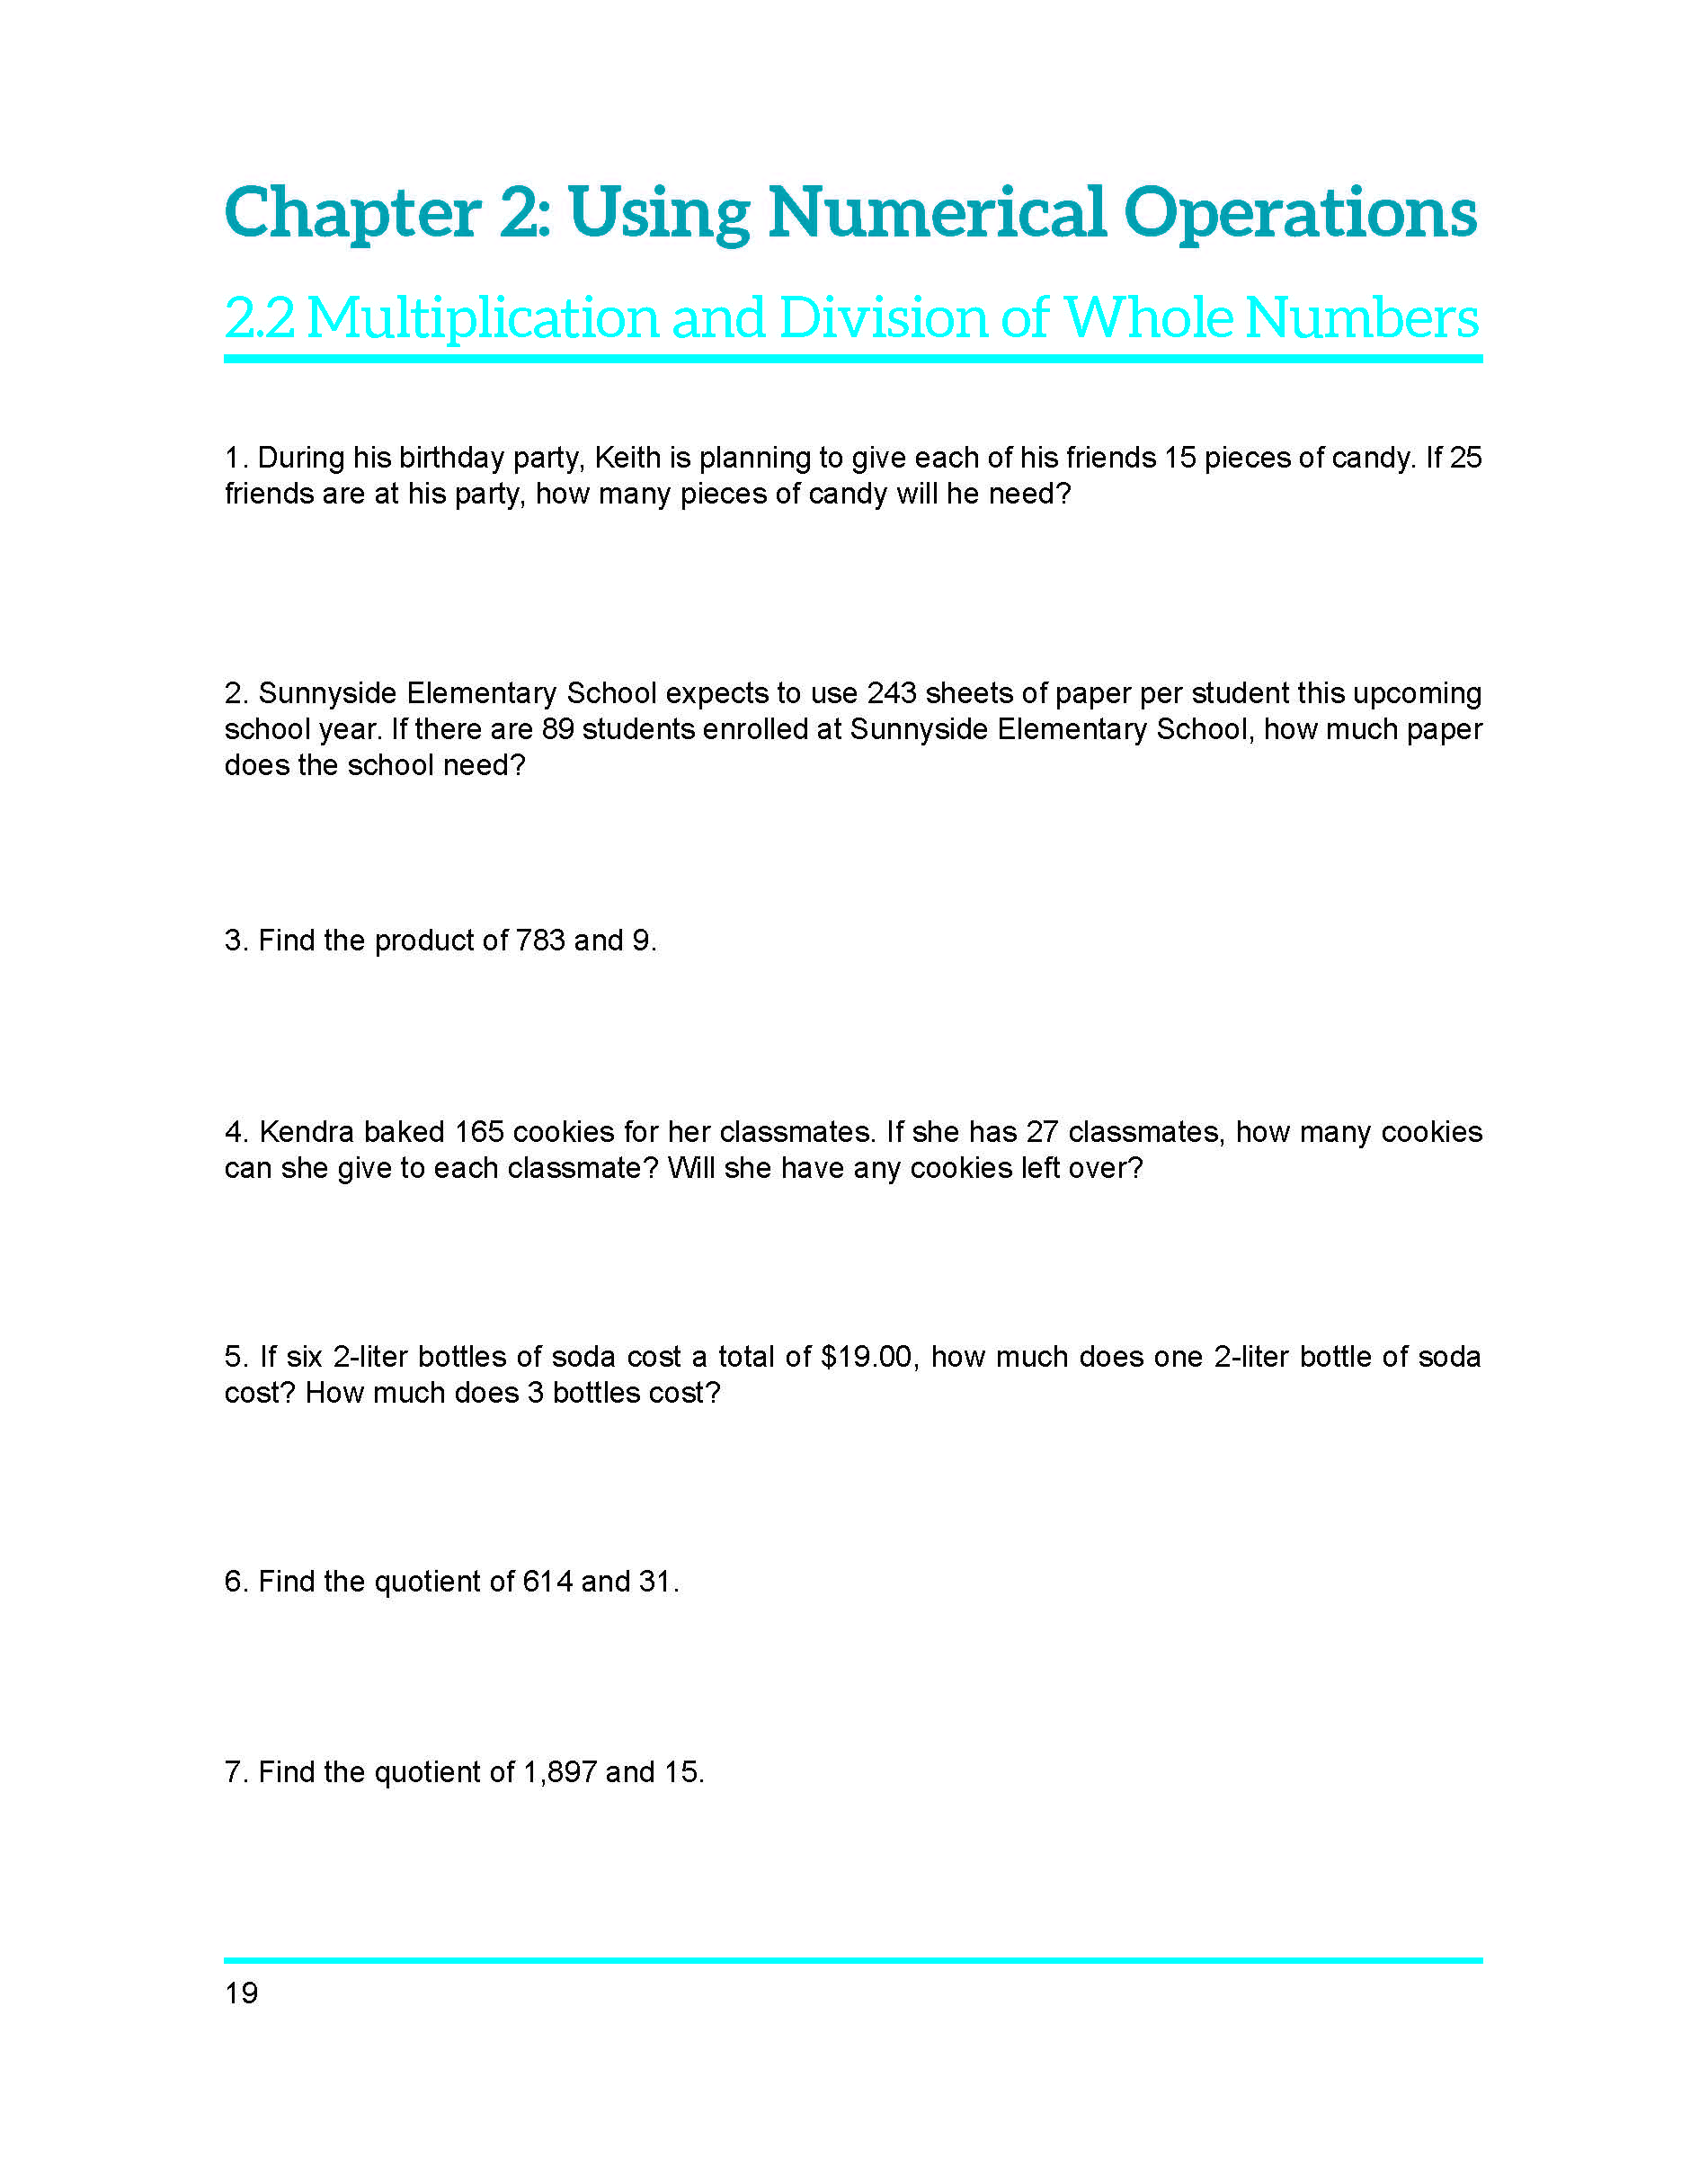 Grade-6-Numerical Operations.jpg